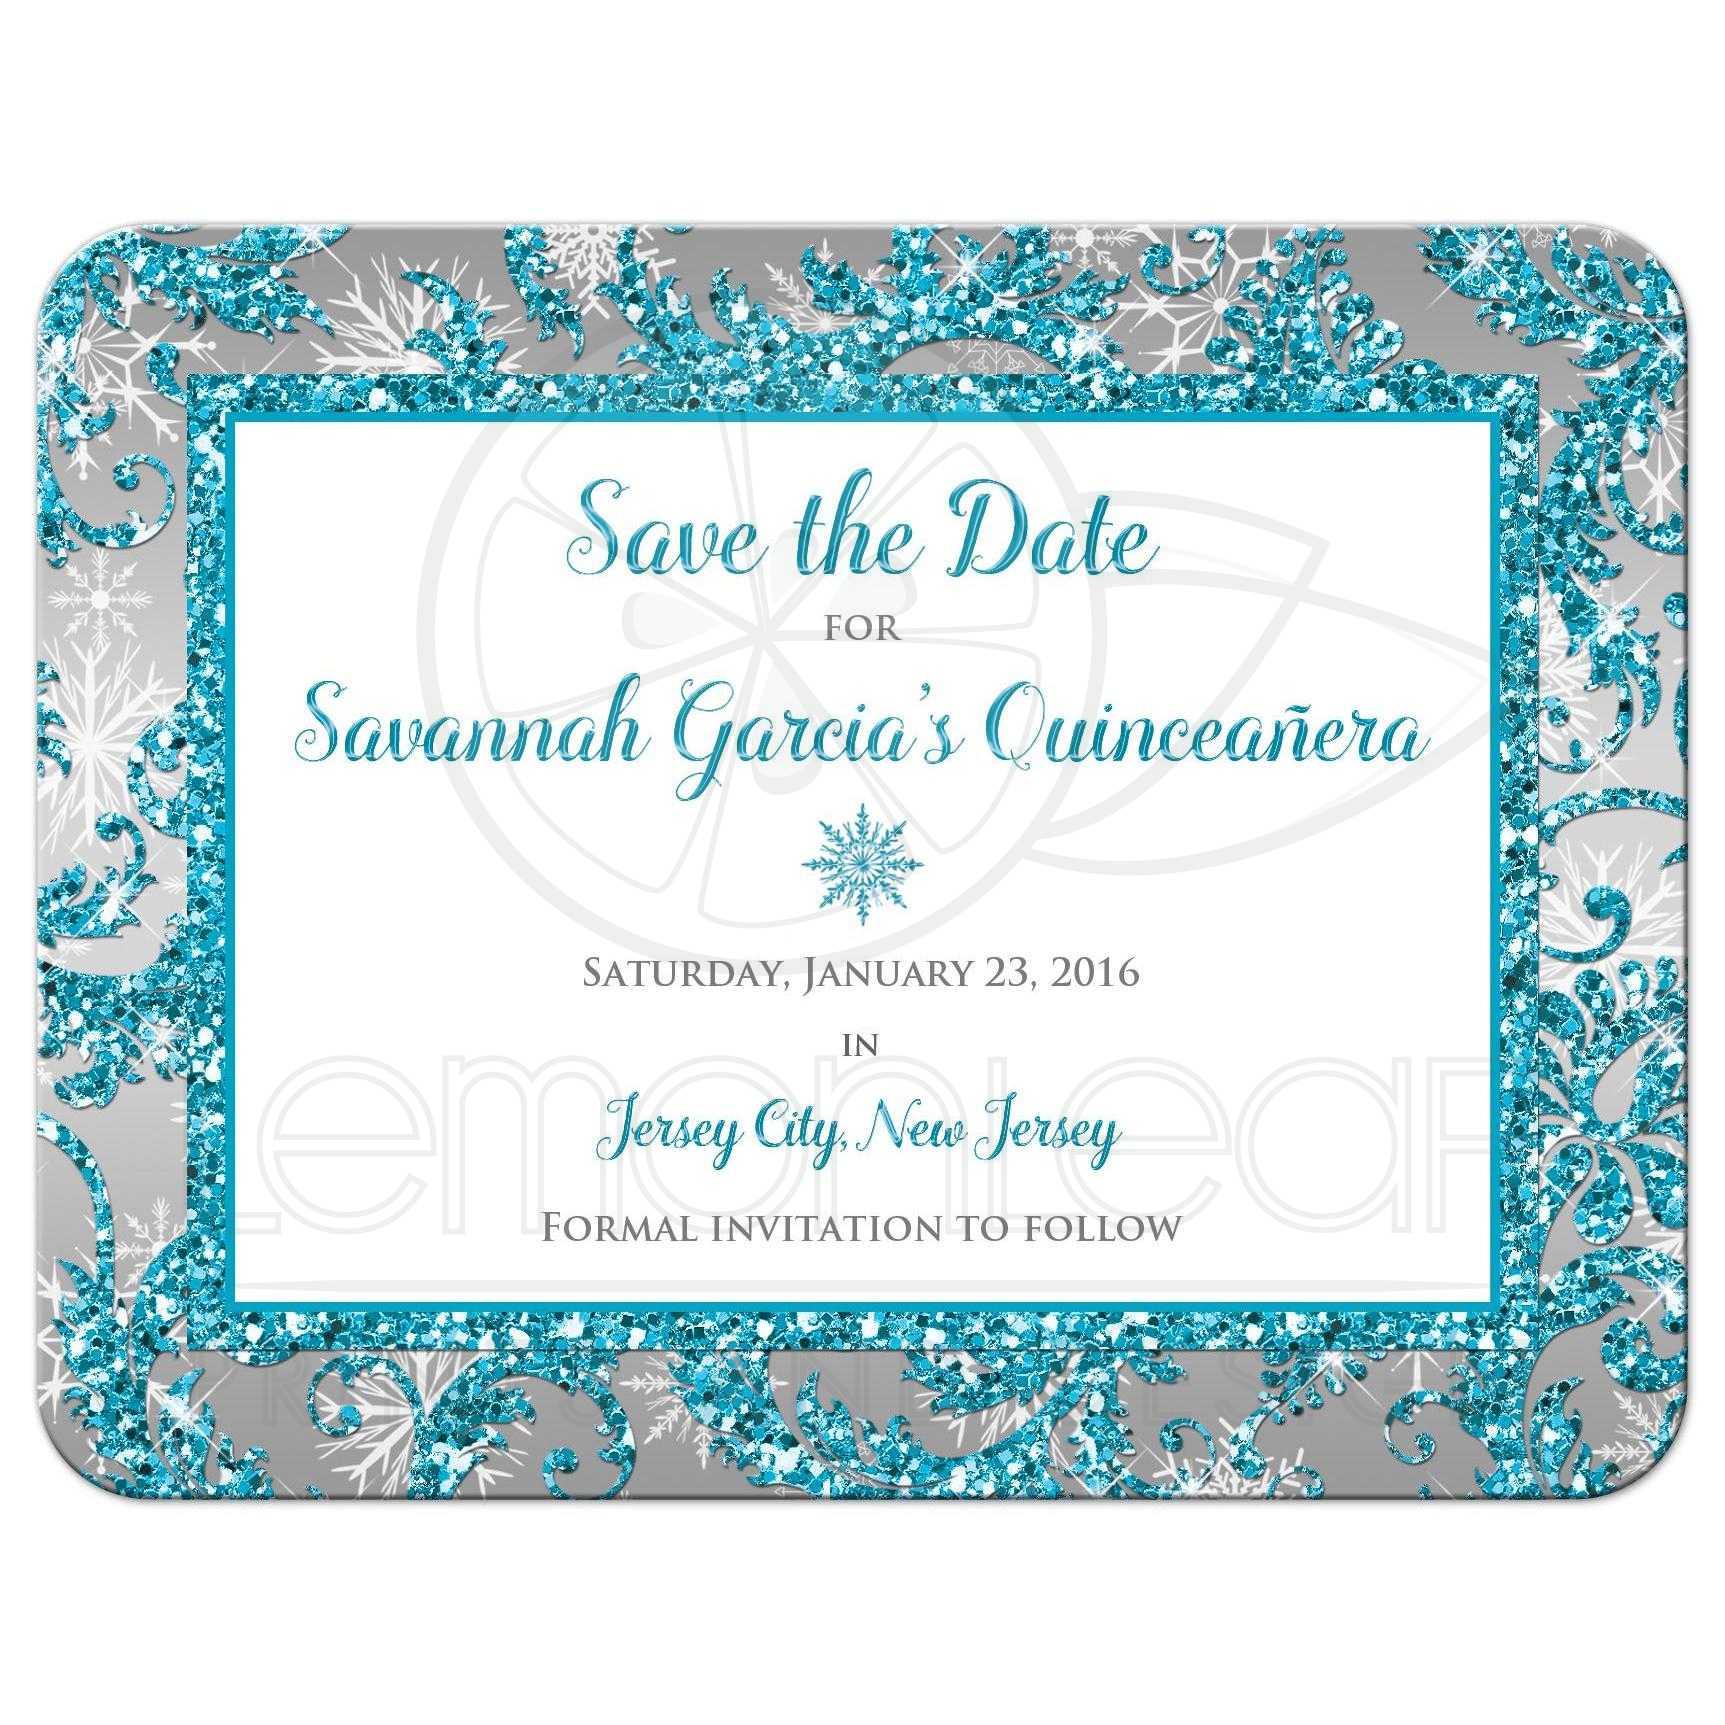 Quinceañera Save the Date Card | Winter Wonderland ...